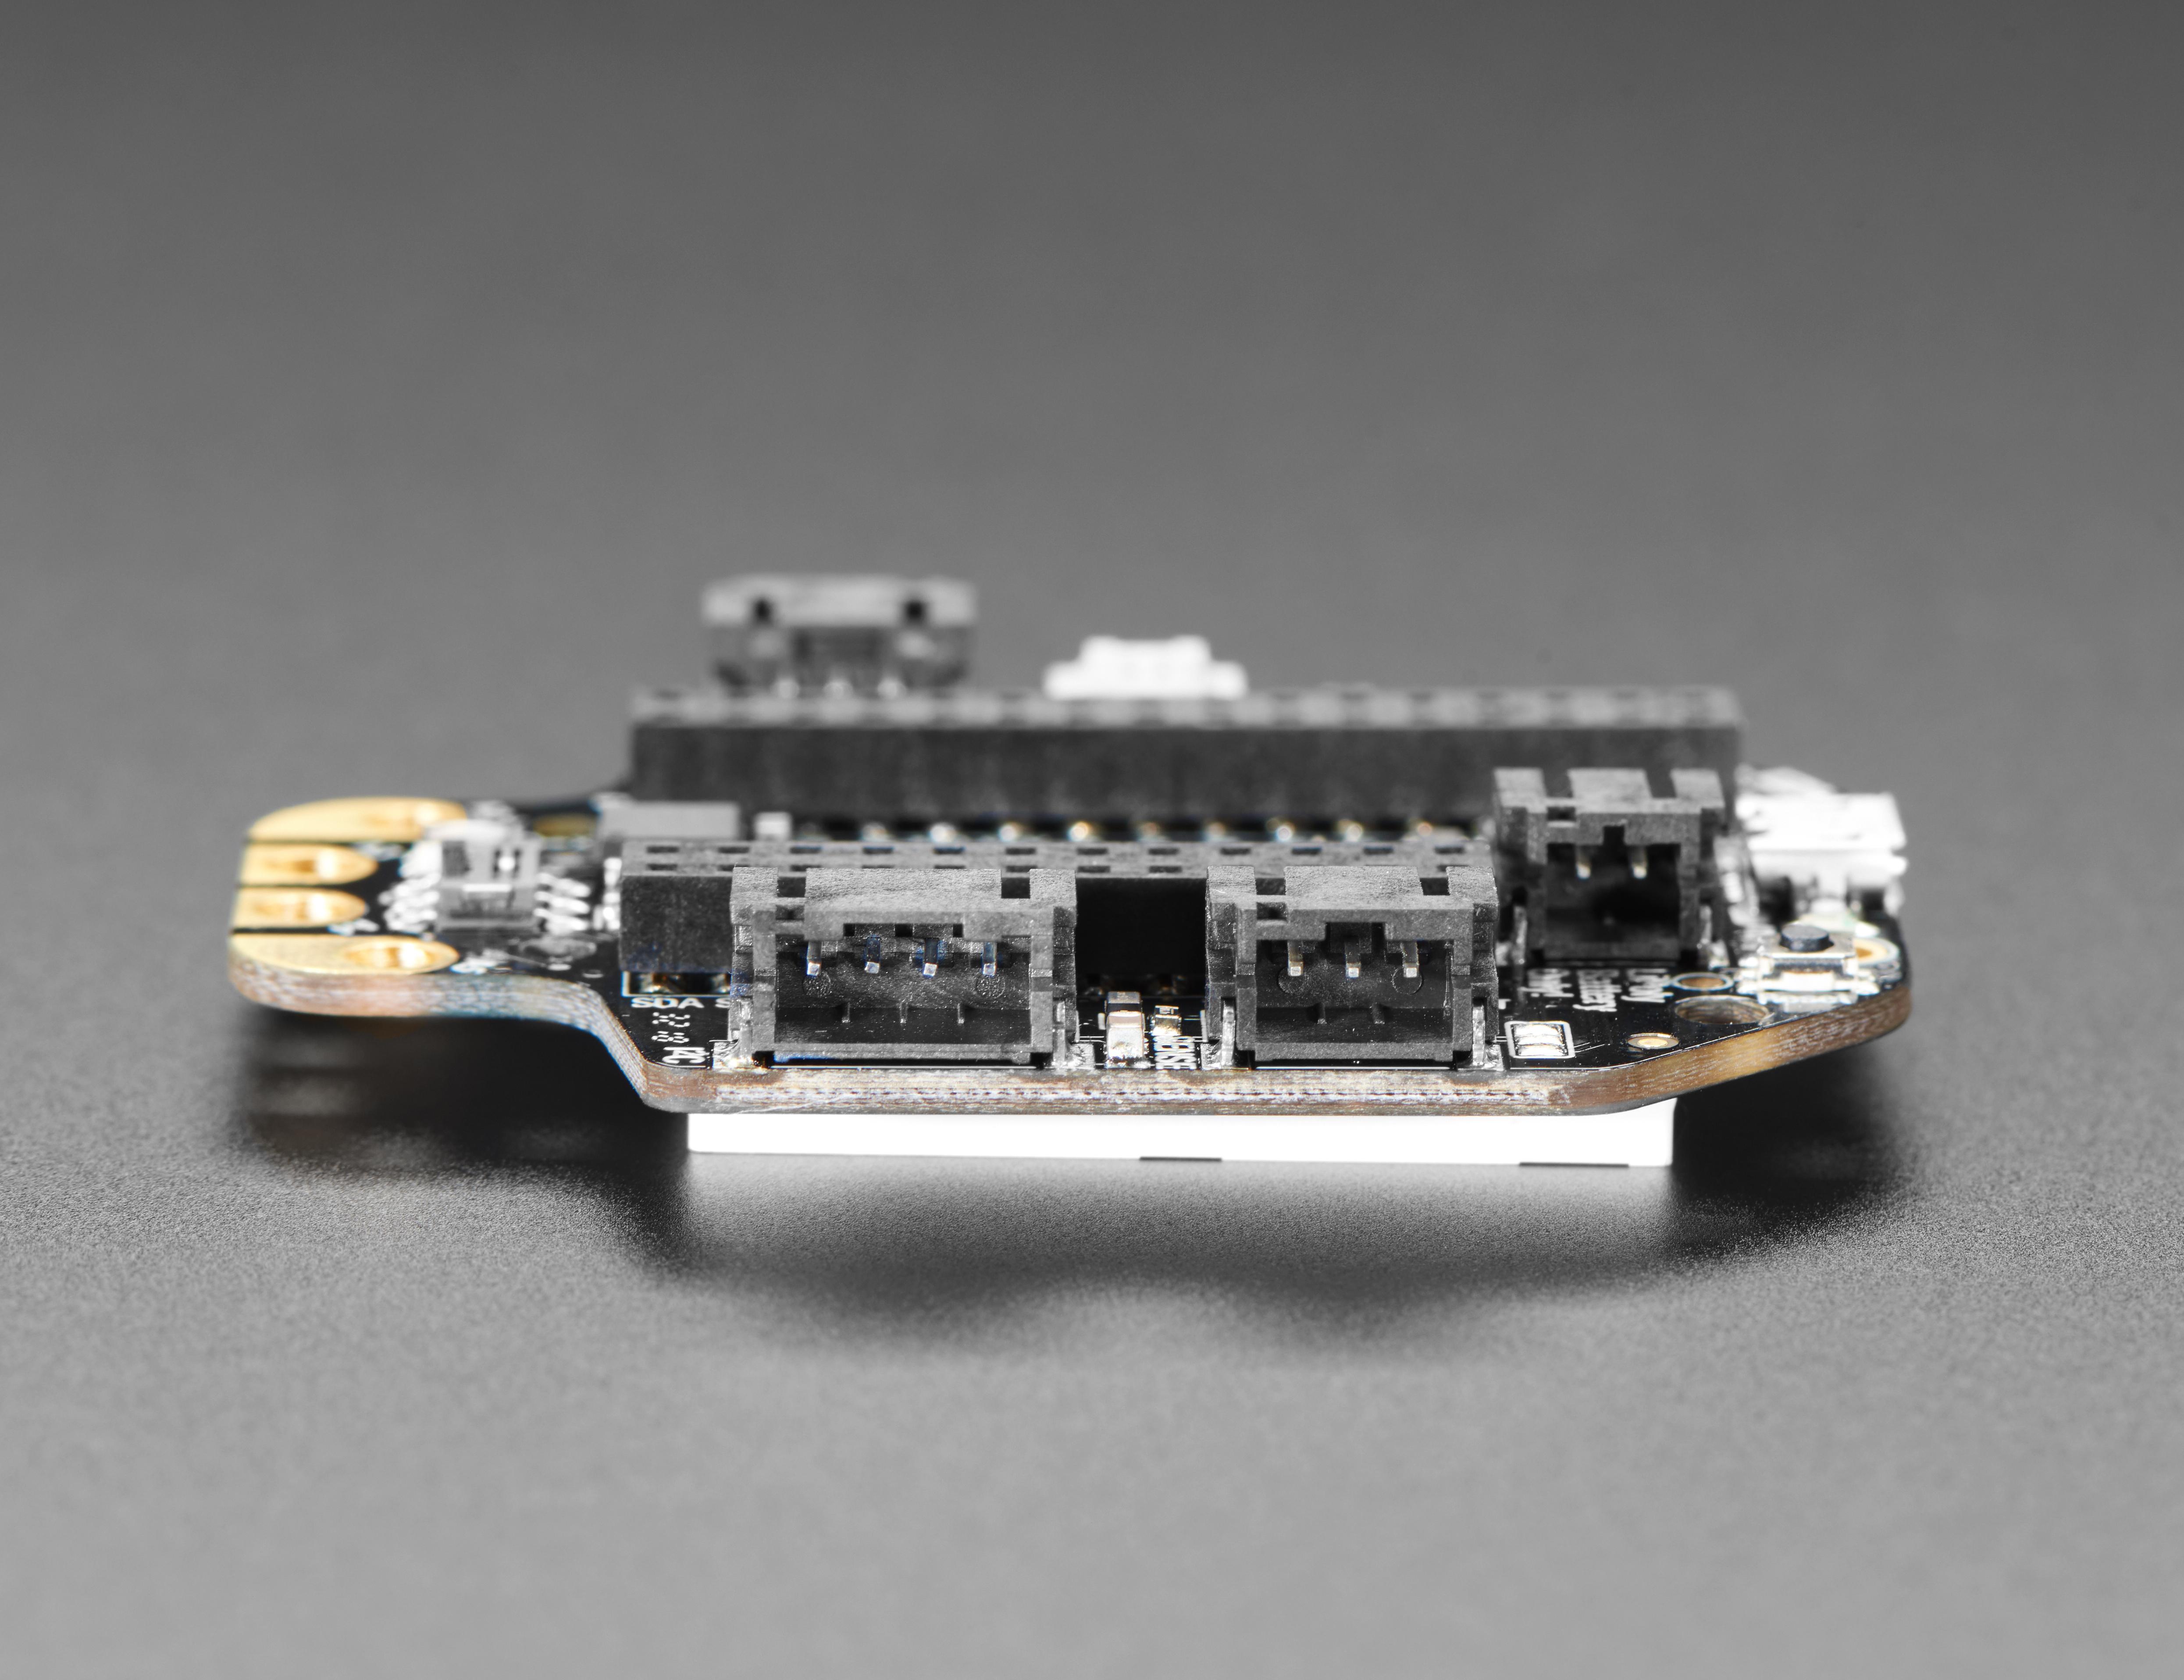 arduino_compatibles_3900_side_02_ORIG_2018_08.jpg